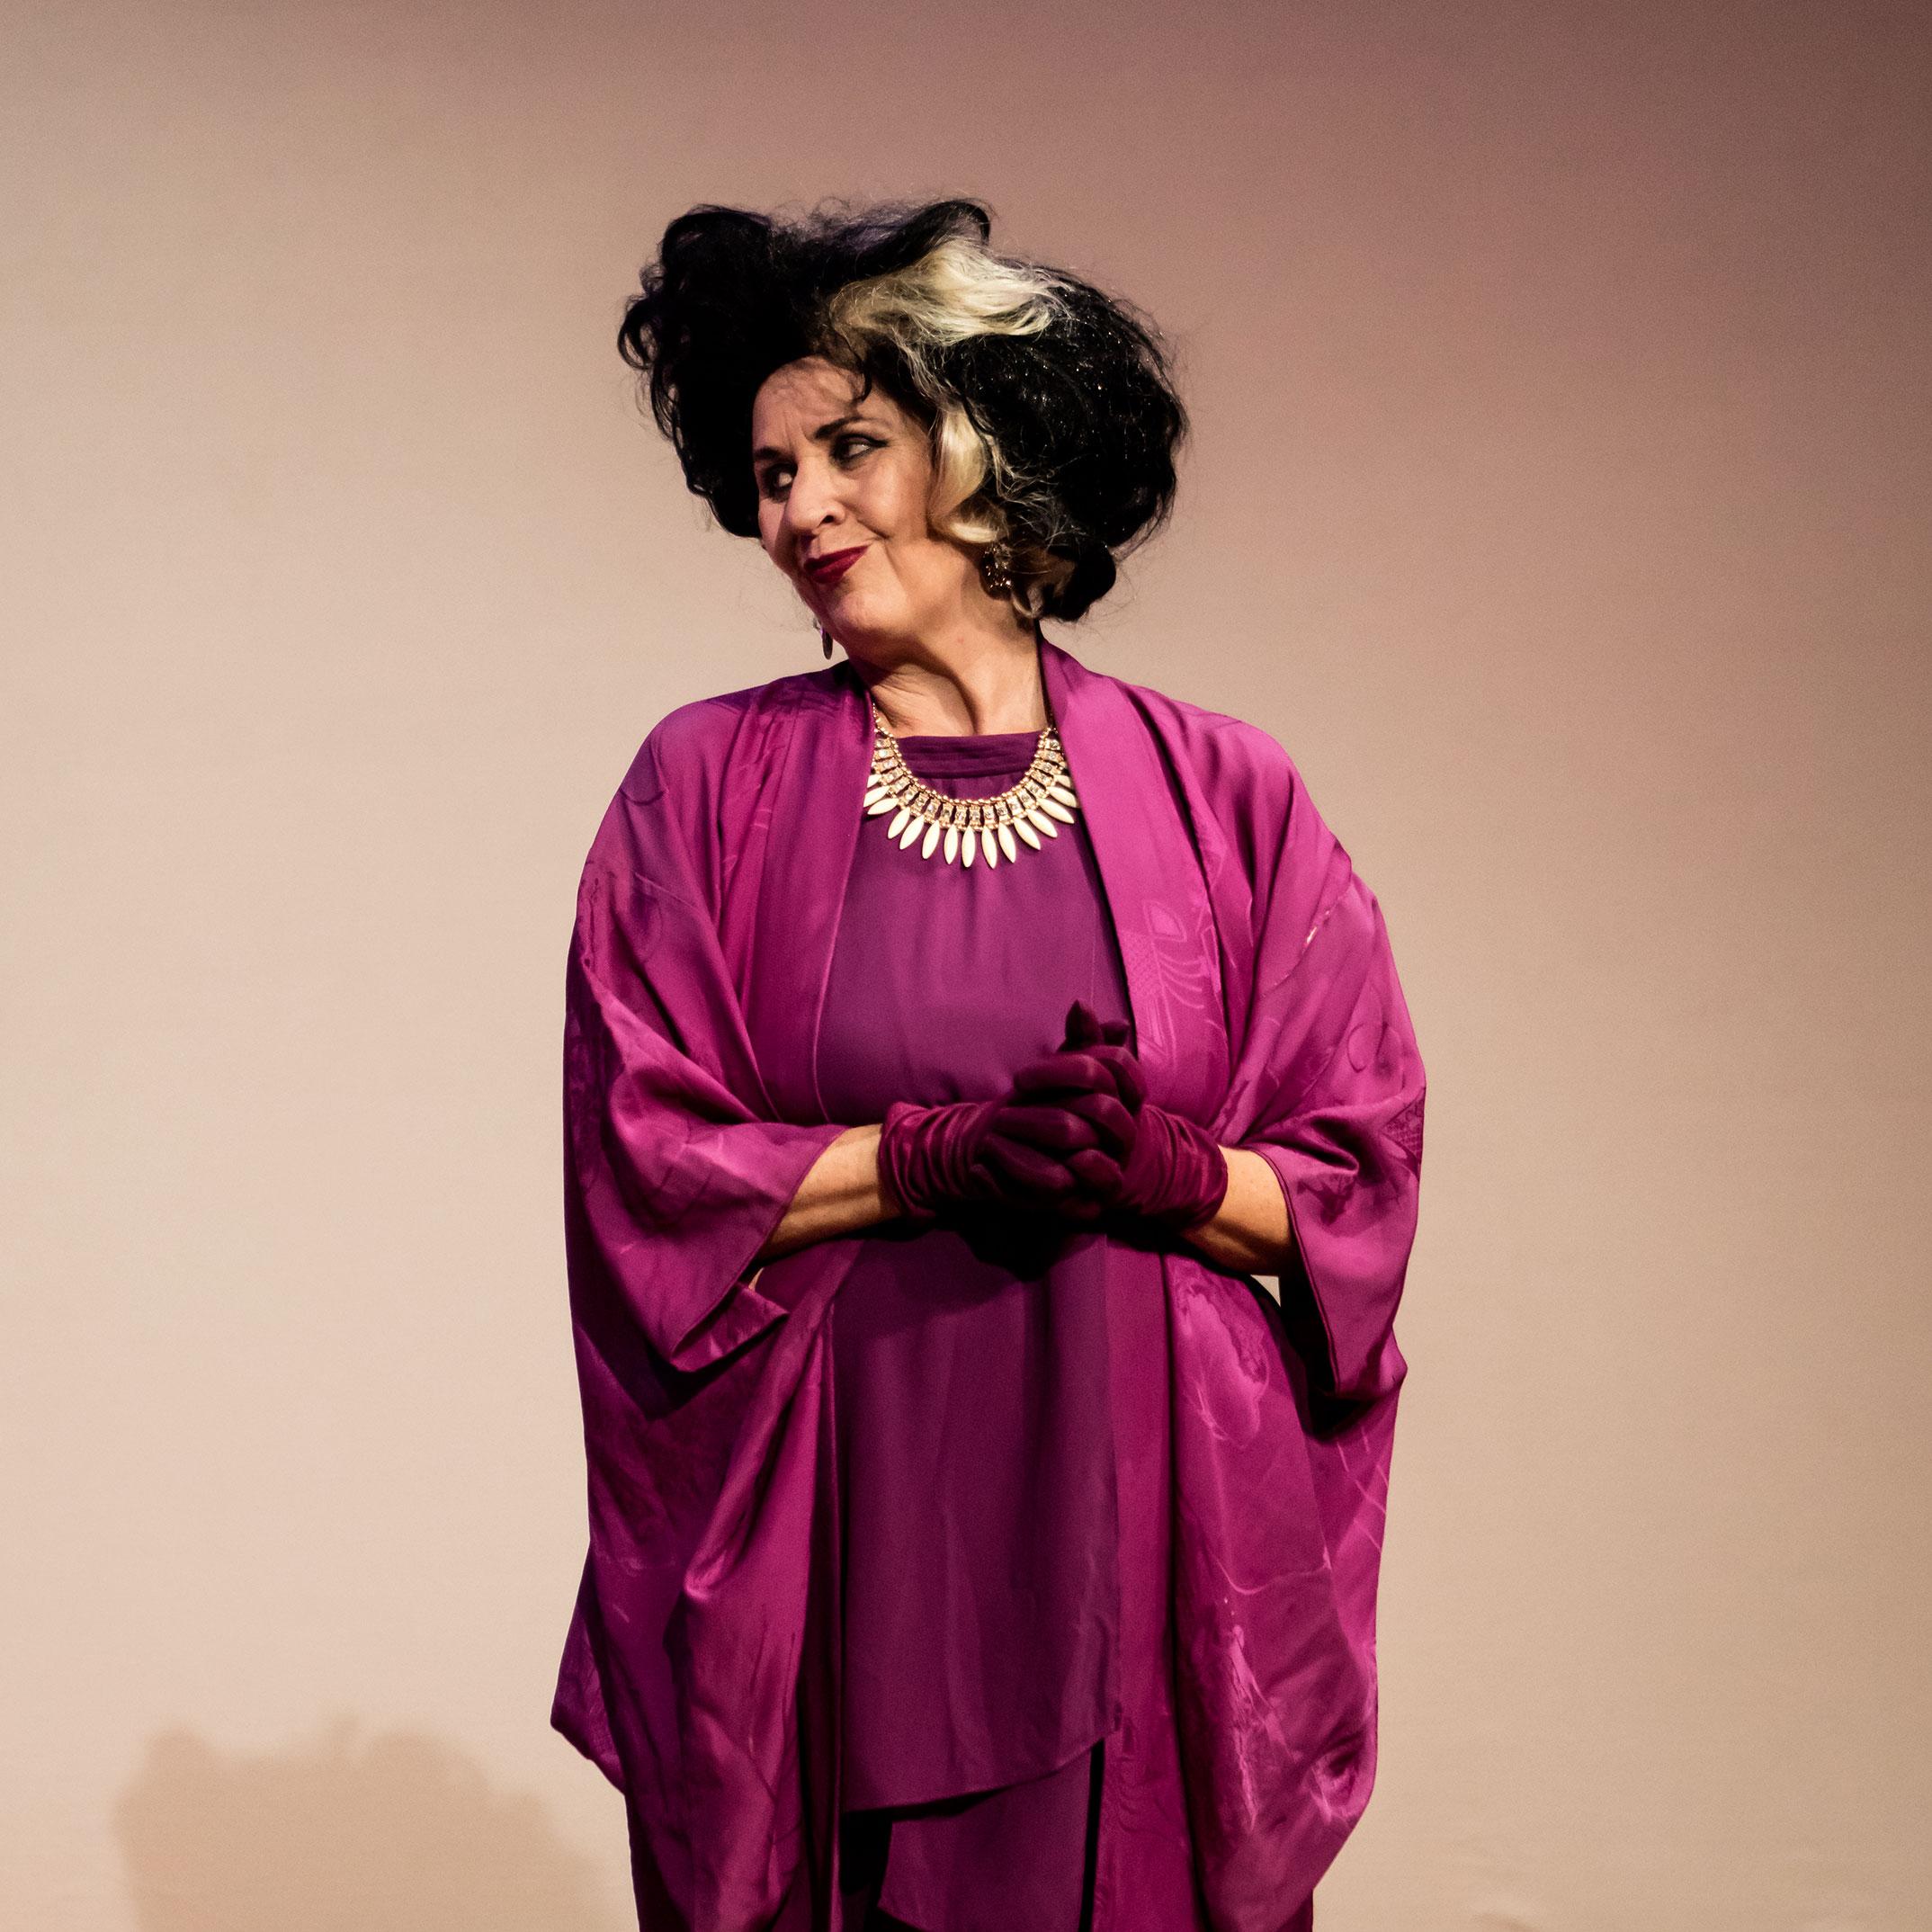 Merrilee Mills as Augusta. Photo by Paolo Randazzo.